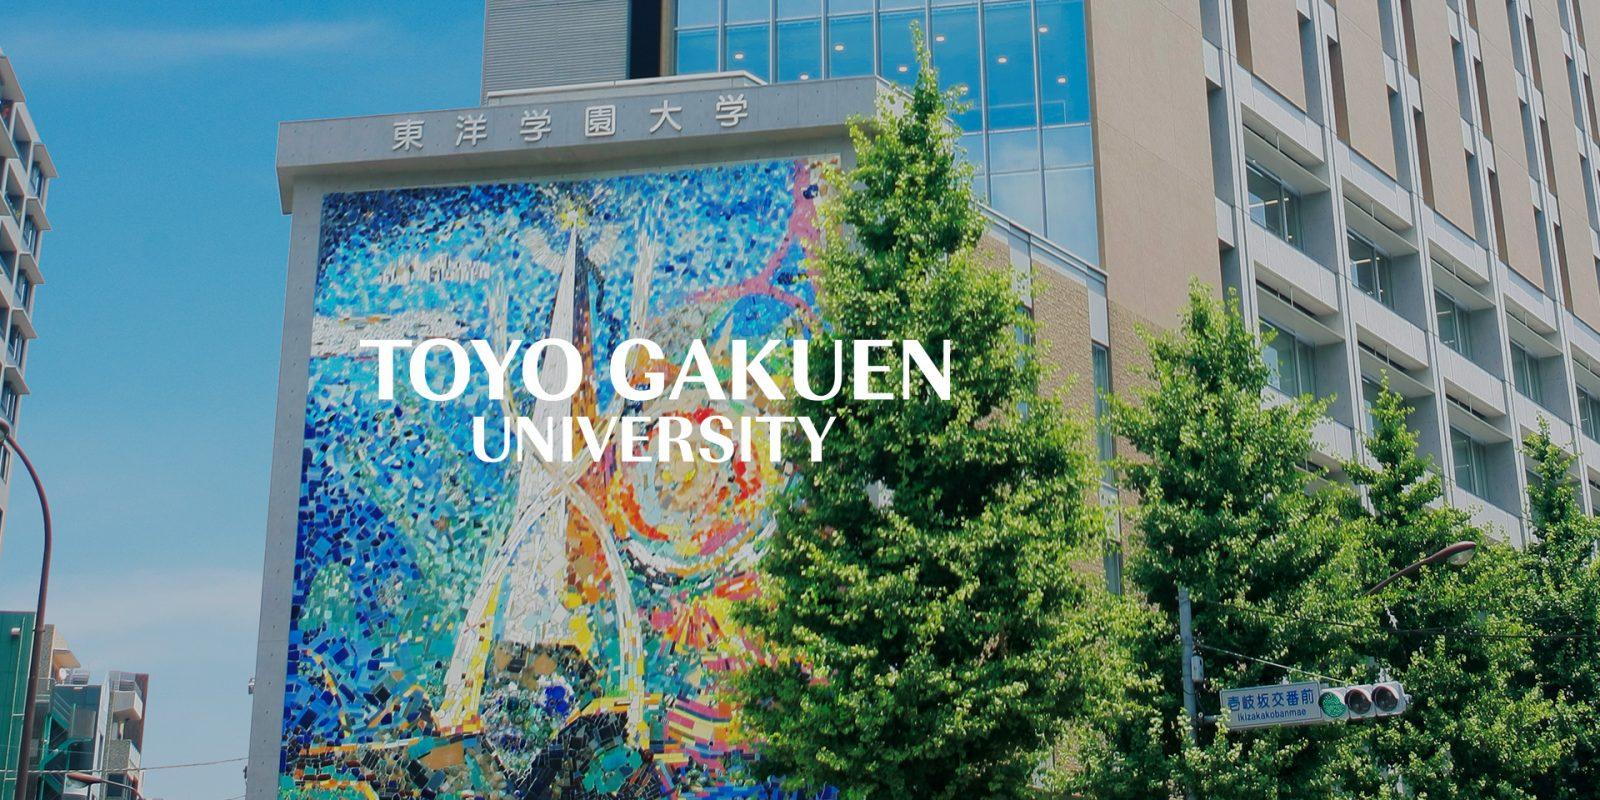 TOYO GAKUIN UNIVERSITY